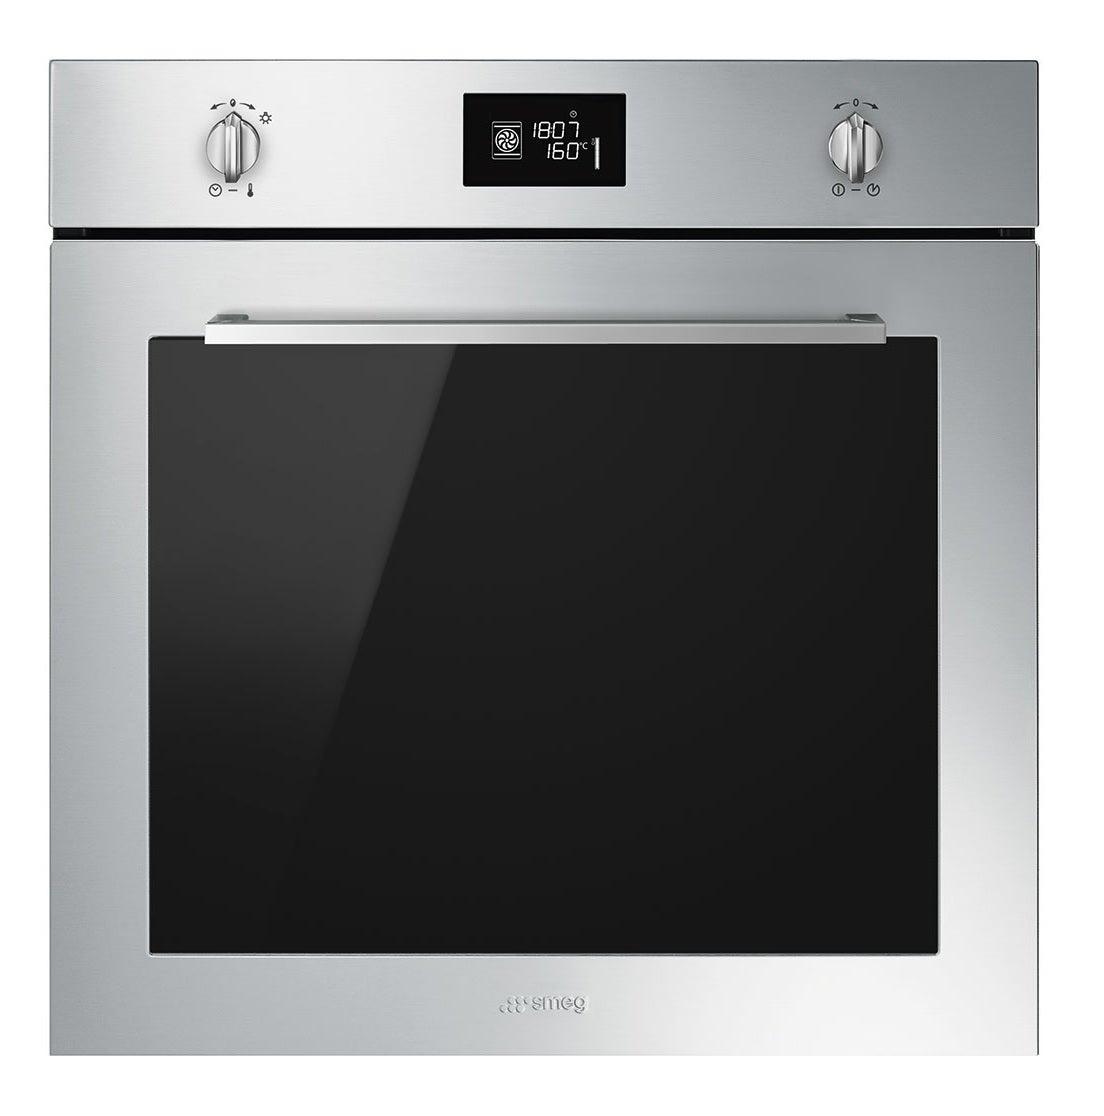 Smeg SF6402TVX Oven